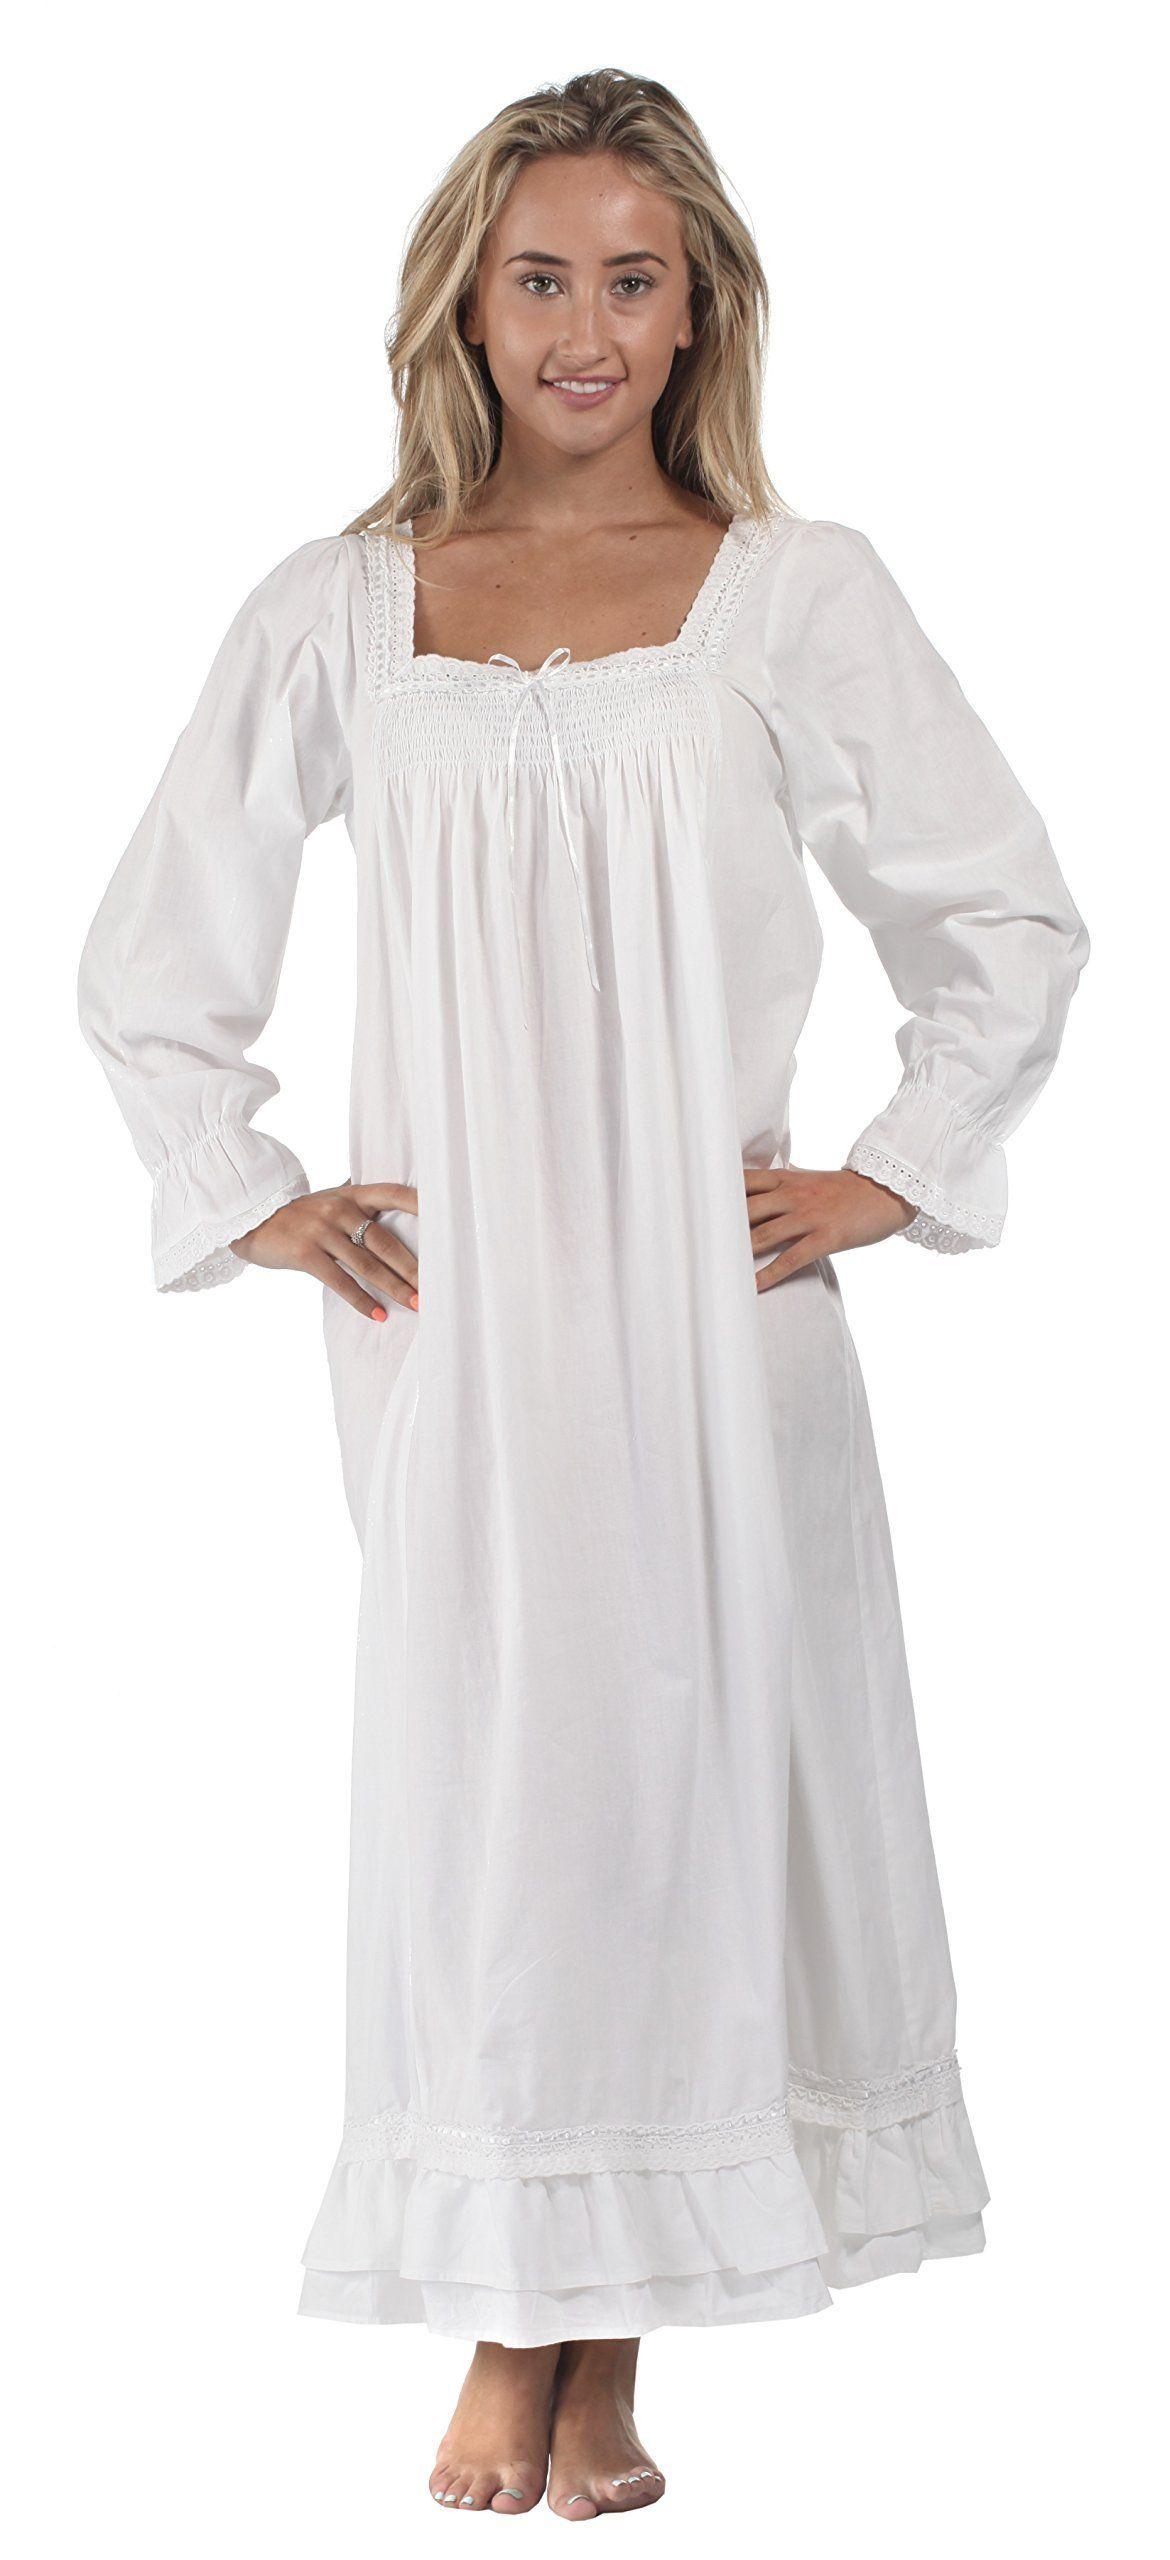 The 1 For U Damen Nachthemd Martha Weiss Small